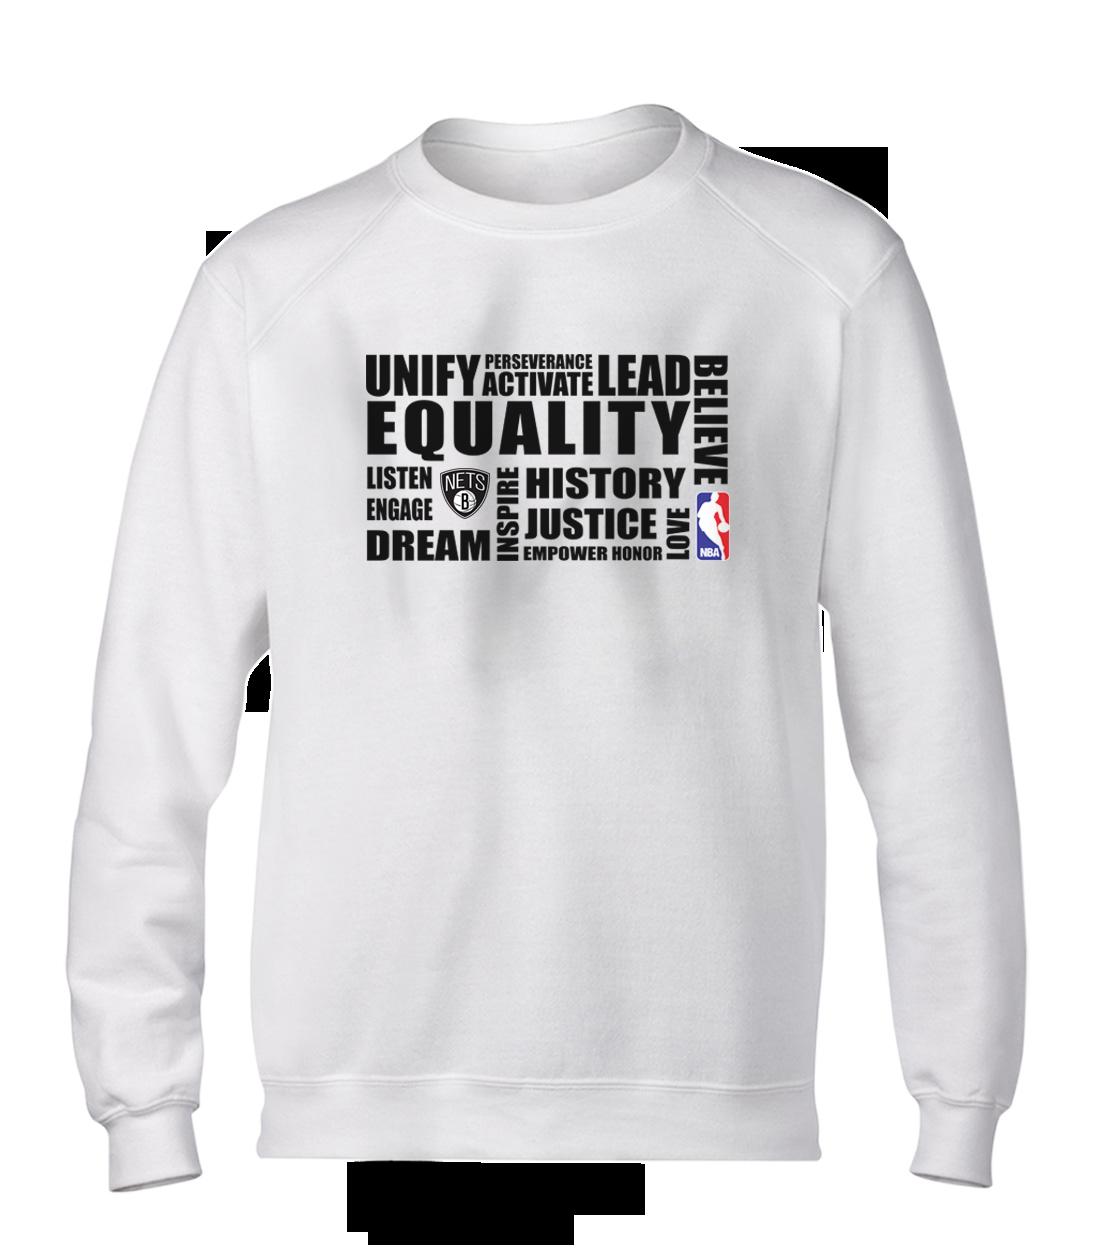 EQUALITY Brooklyn Nets Basic (BSC-WHT-NP-292-NBA.BRKL.syh)